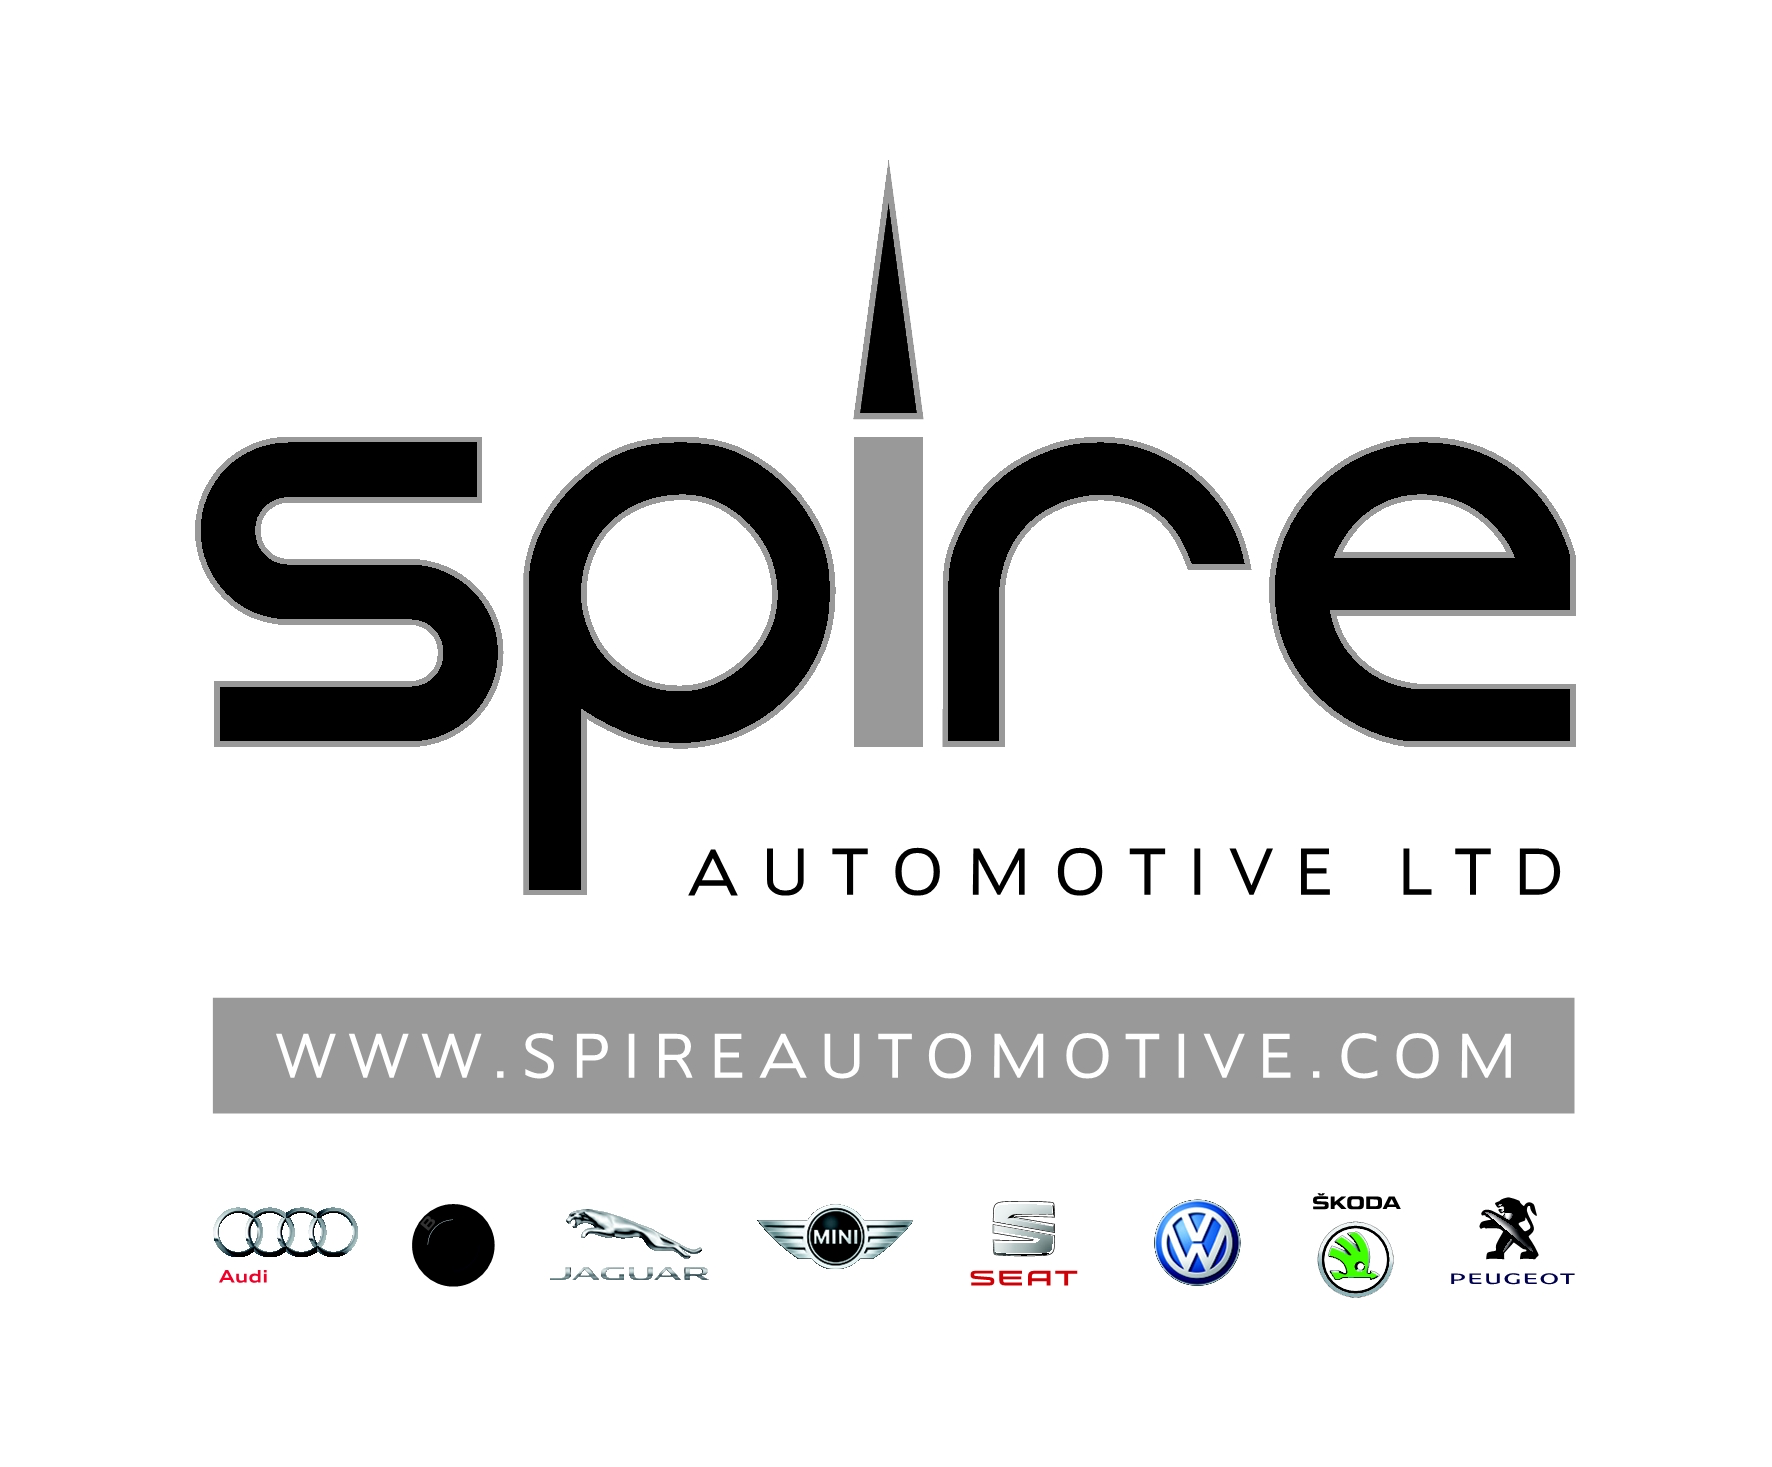 Spire Automotive